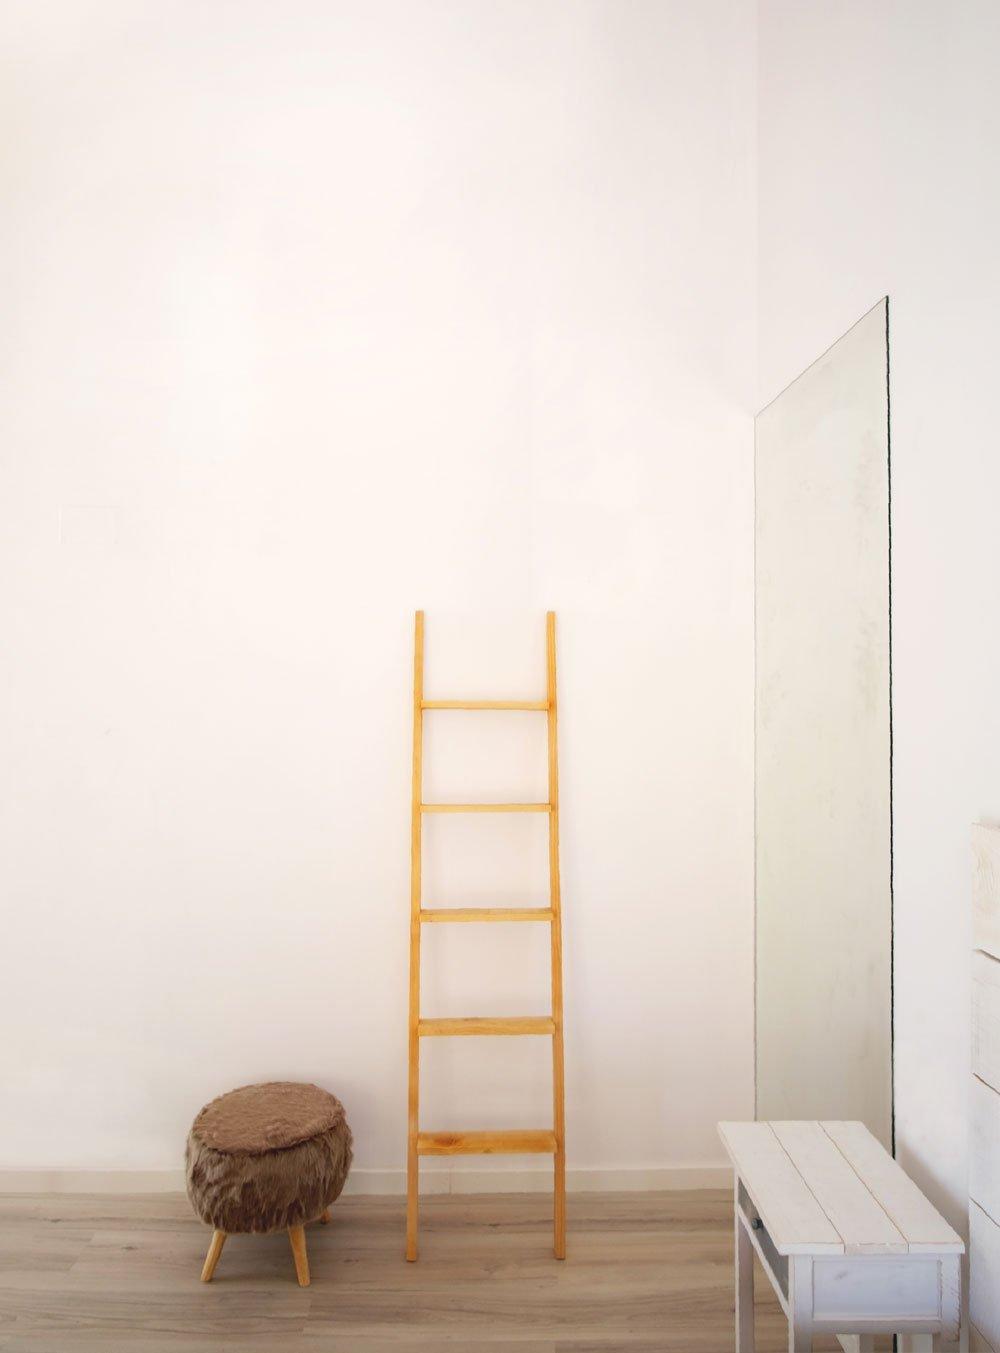 vivienda-modular-caldearenas-interior-3